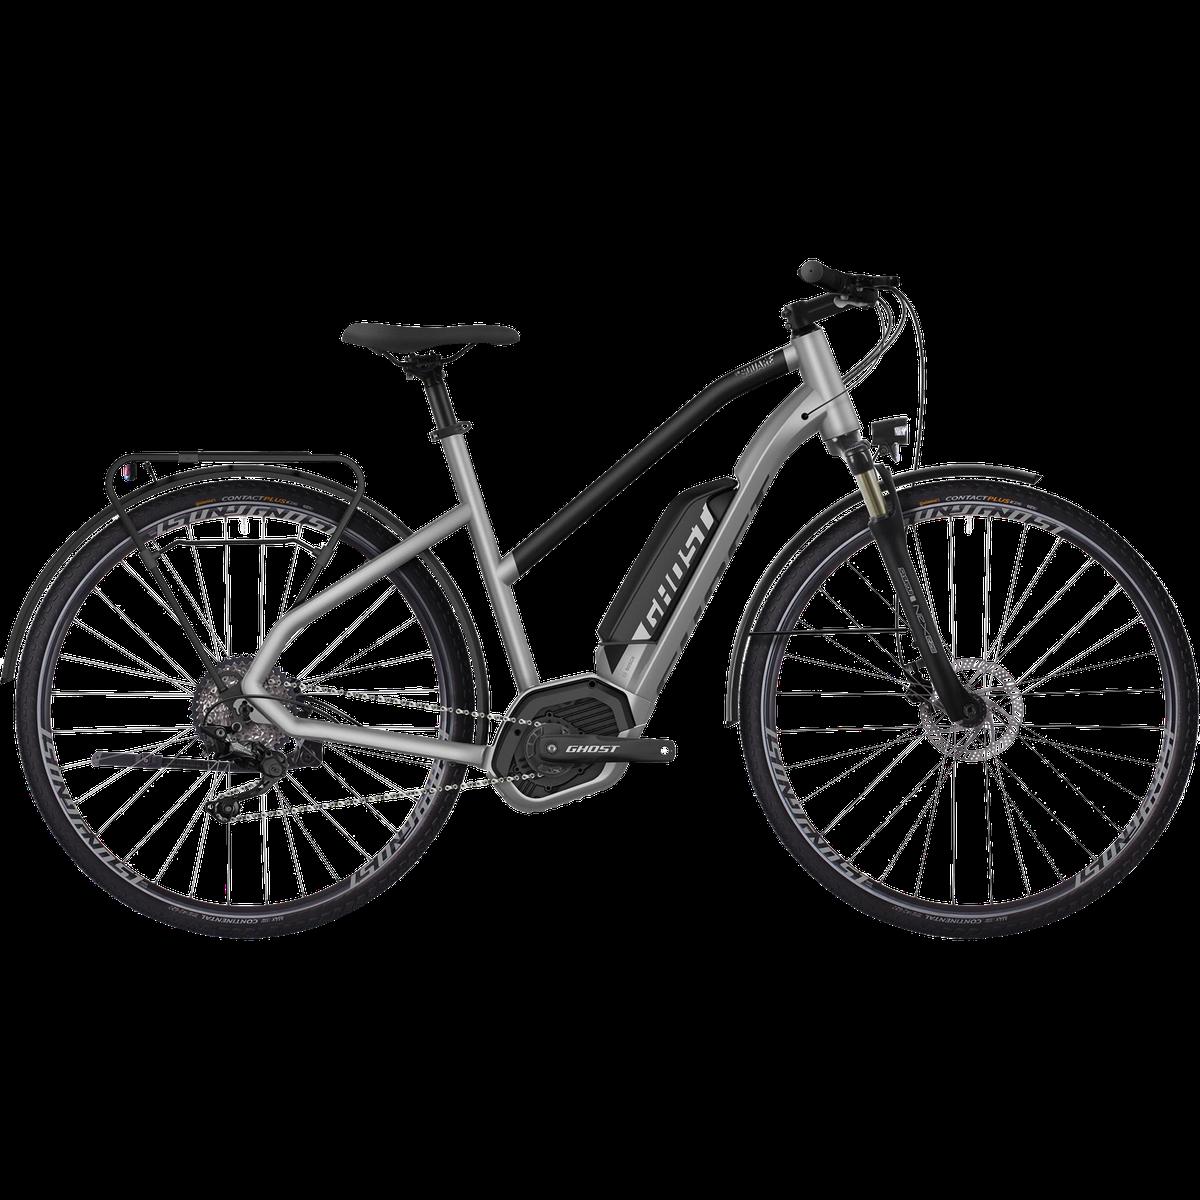 HYB Square Trekking 2,8 CX5 19, elcykel, dame, Hvid   City